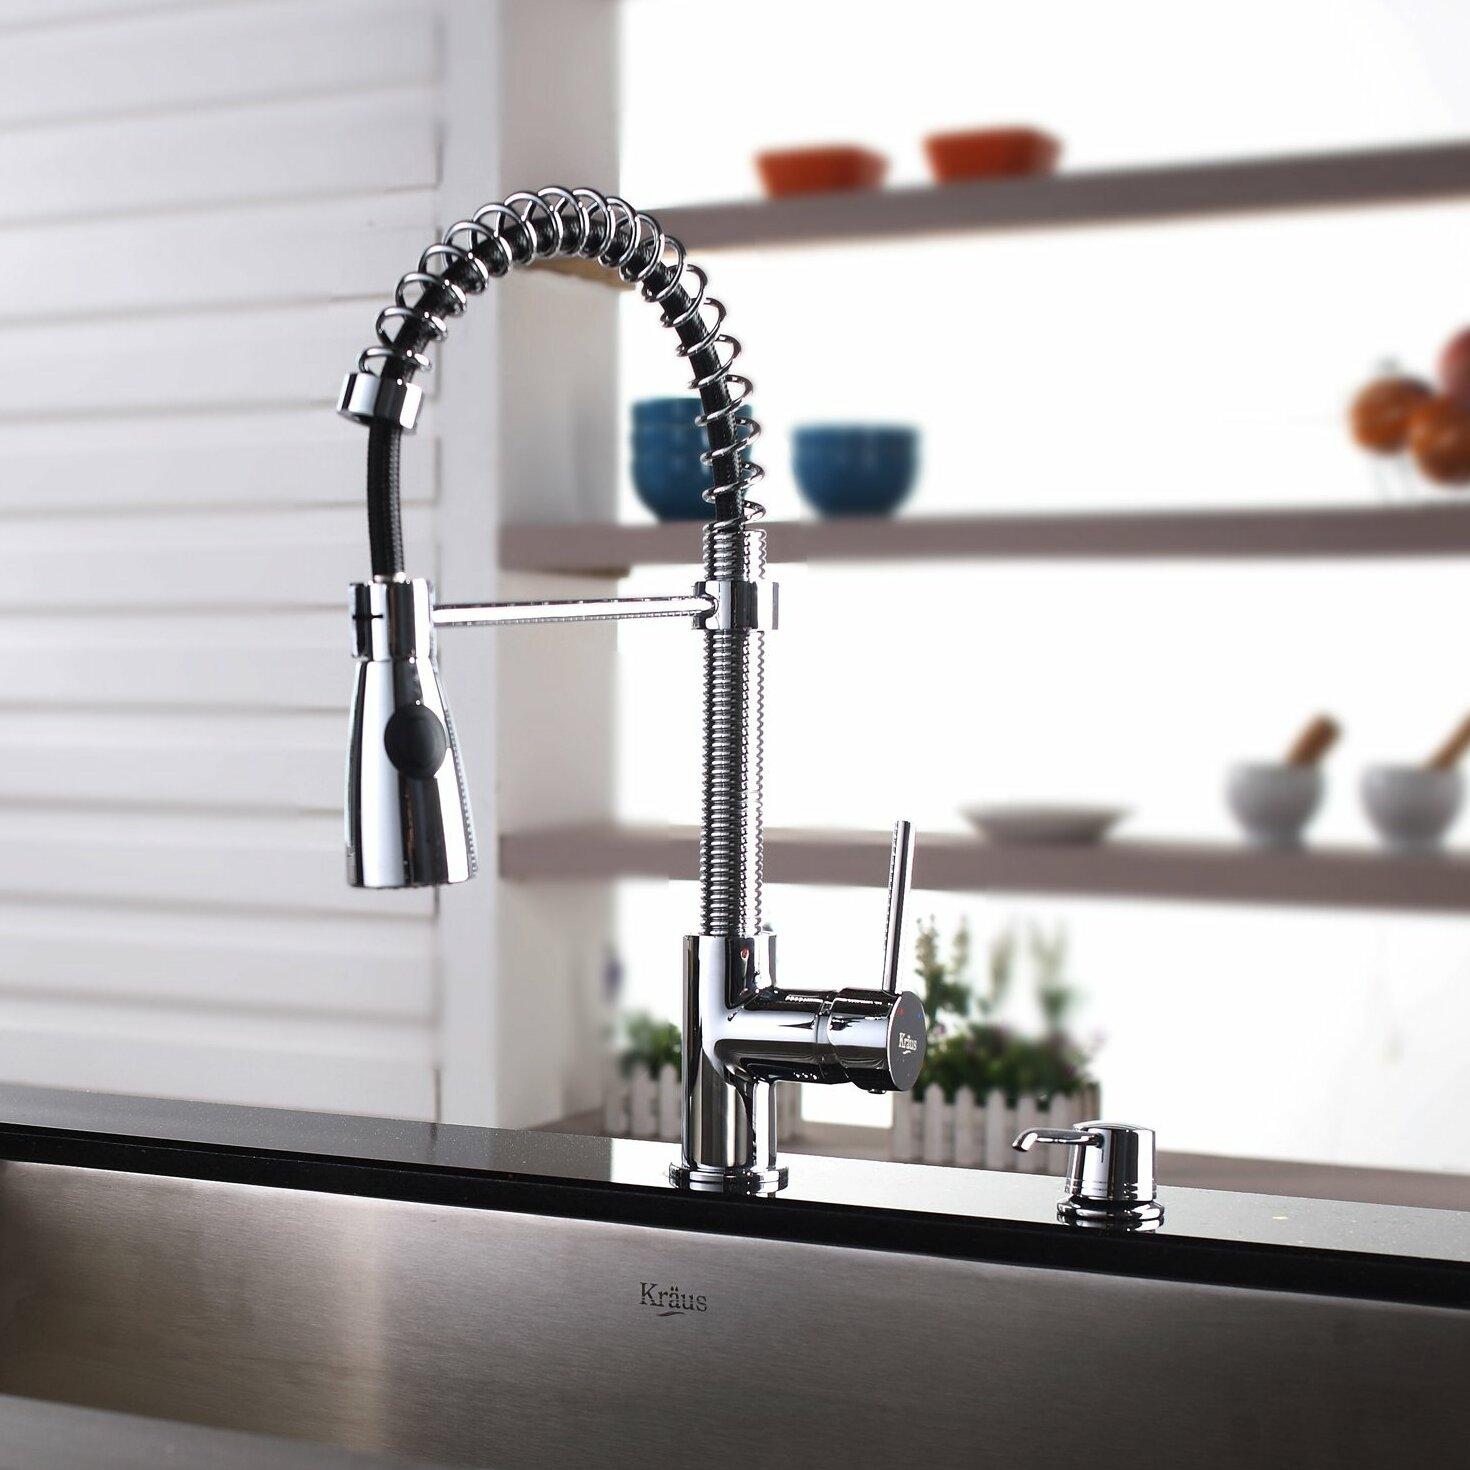 Kpf 1612 Ksd 30ch Ss Kraus Kichen Faucet Combos Single Handle Kitchen Faucet Reviews Wayfair